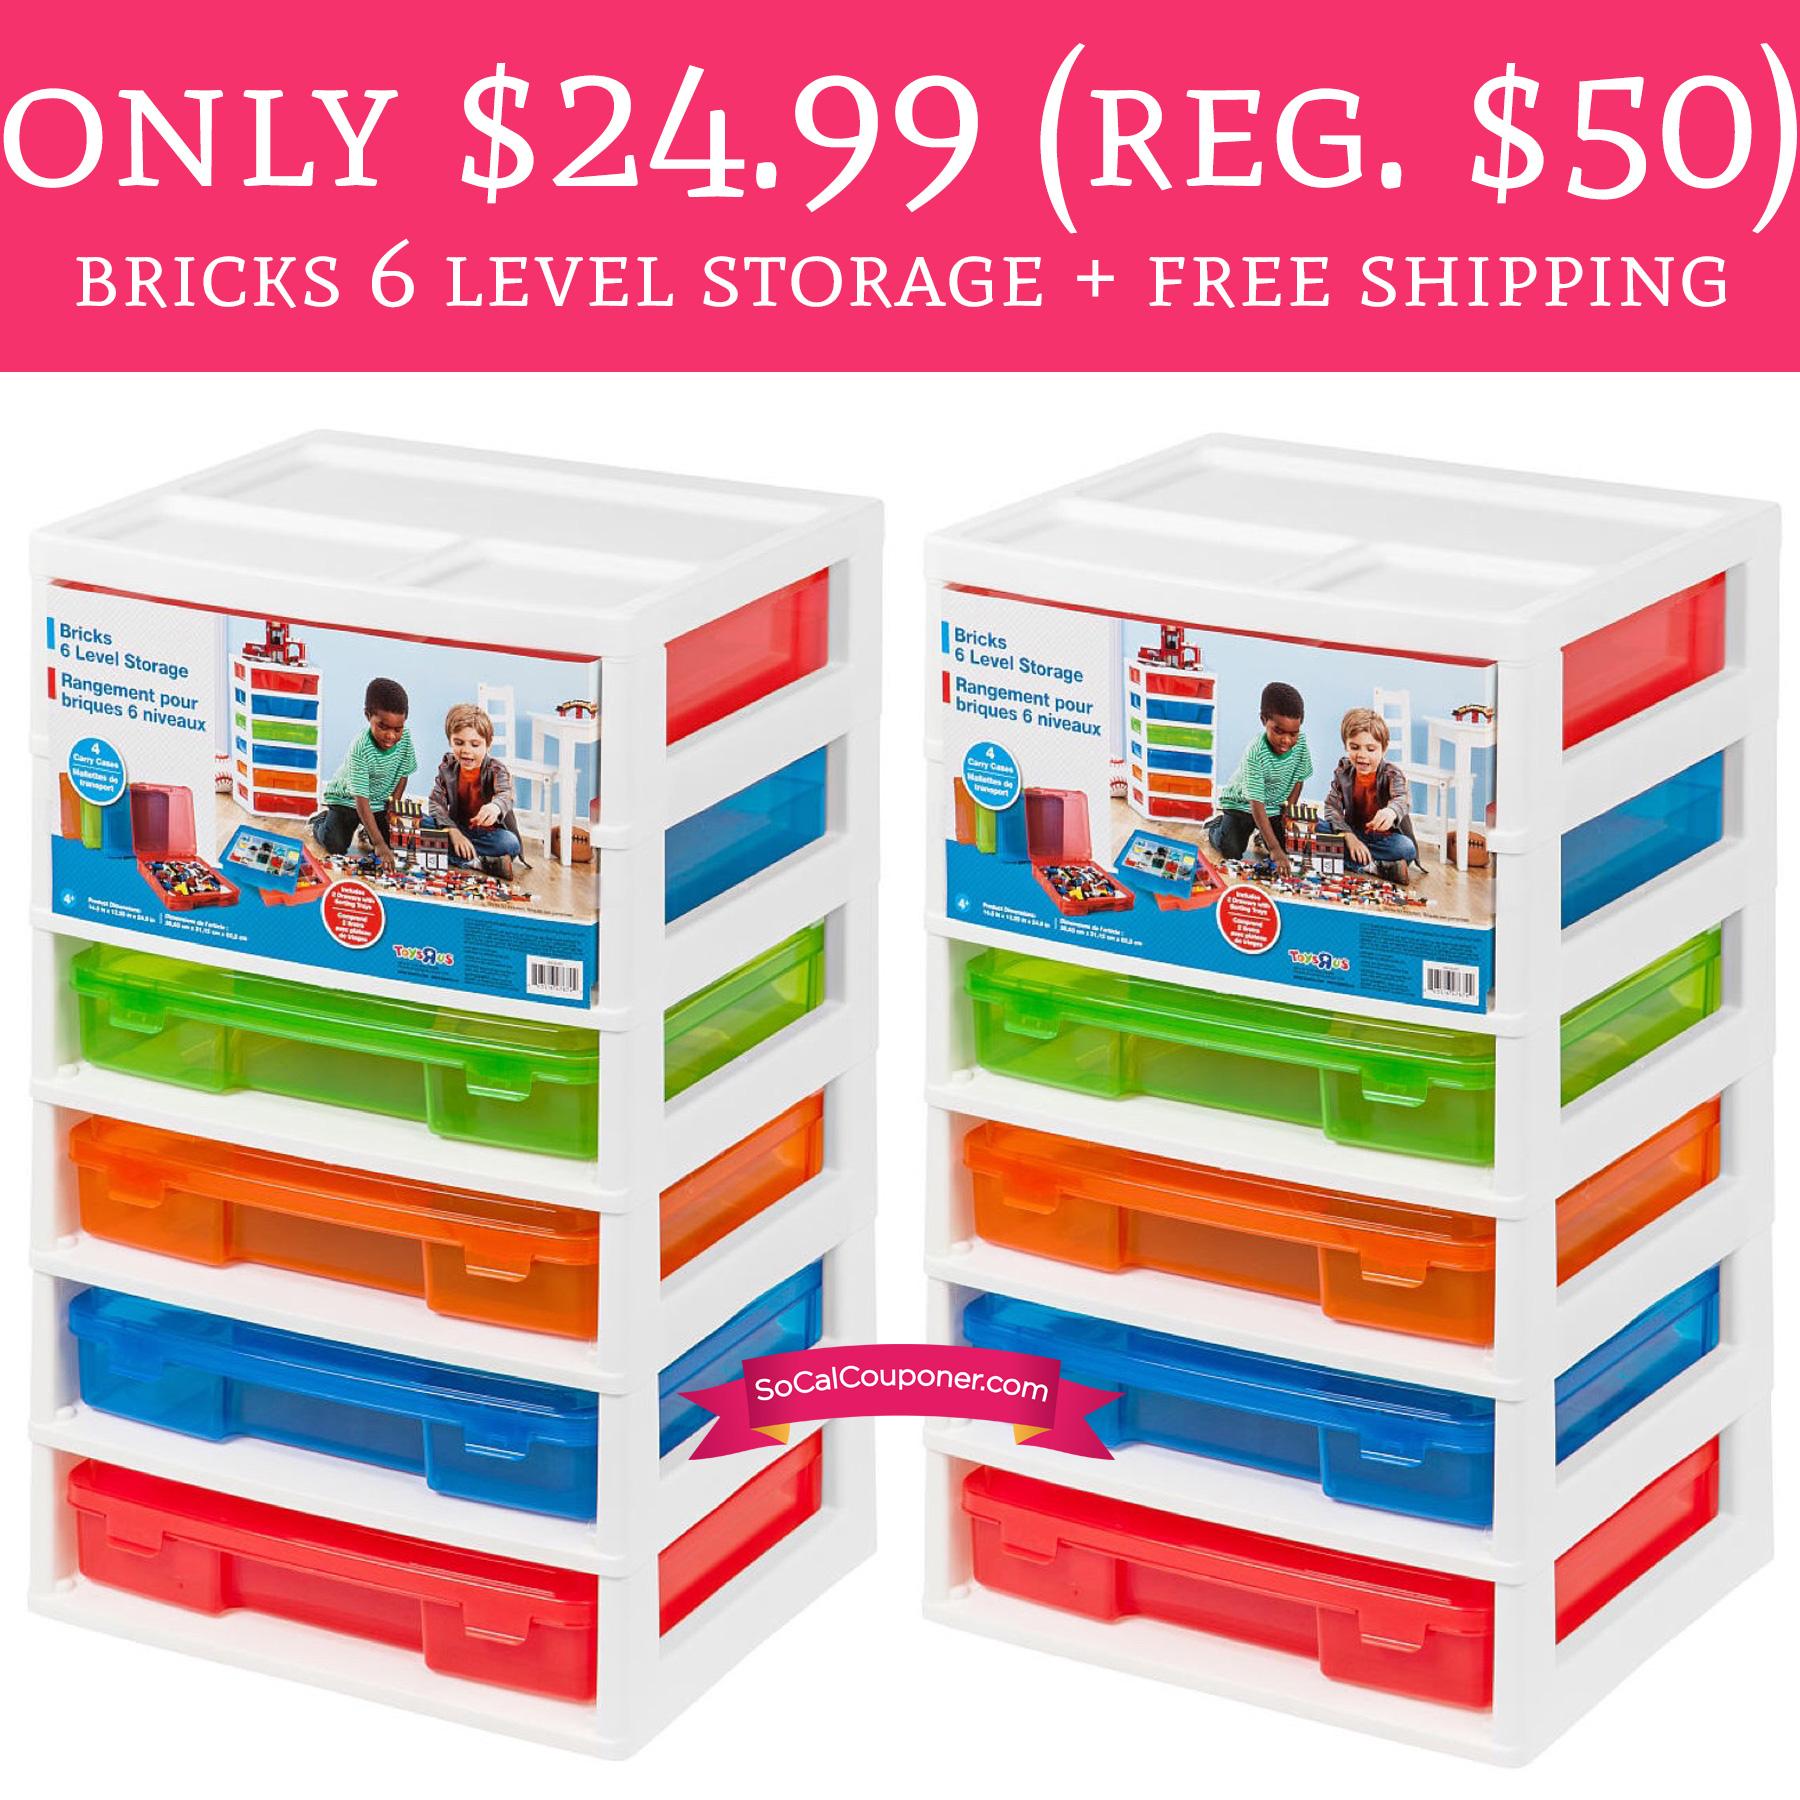 Only 24 99 Regular 50 Bricks 6 Level Storage Free